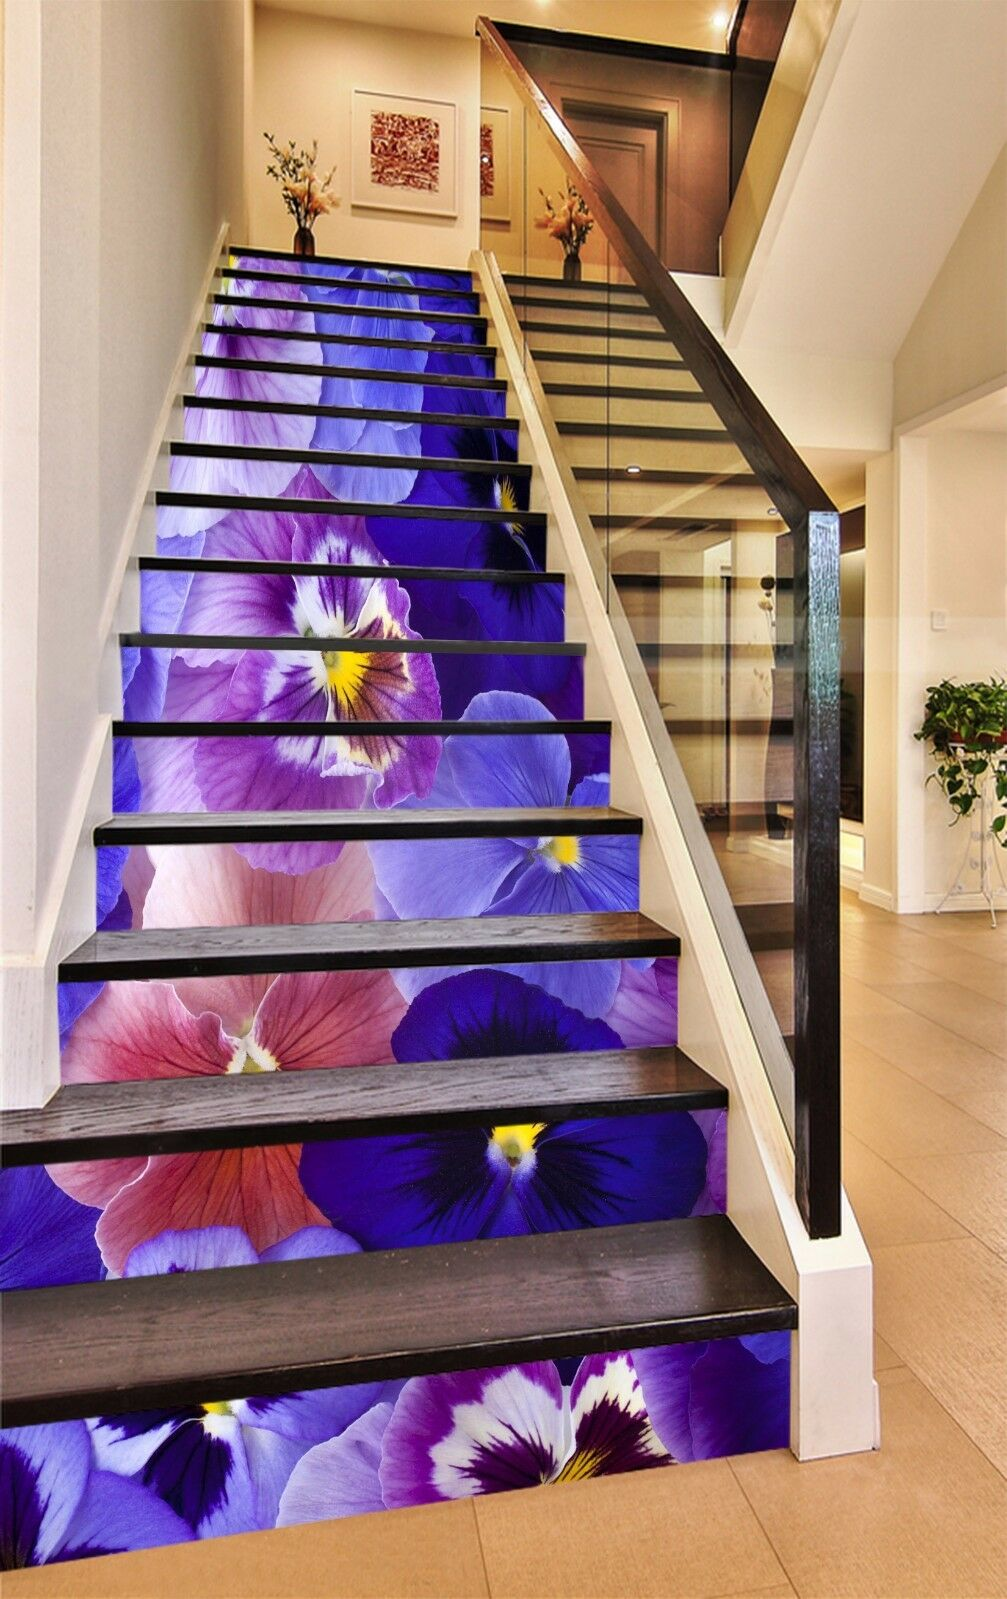 3D Phalaenopsis 613 Stair Risers Decoration Photo Mural Vinyl Decal WandPapier UK